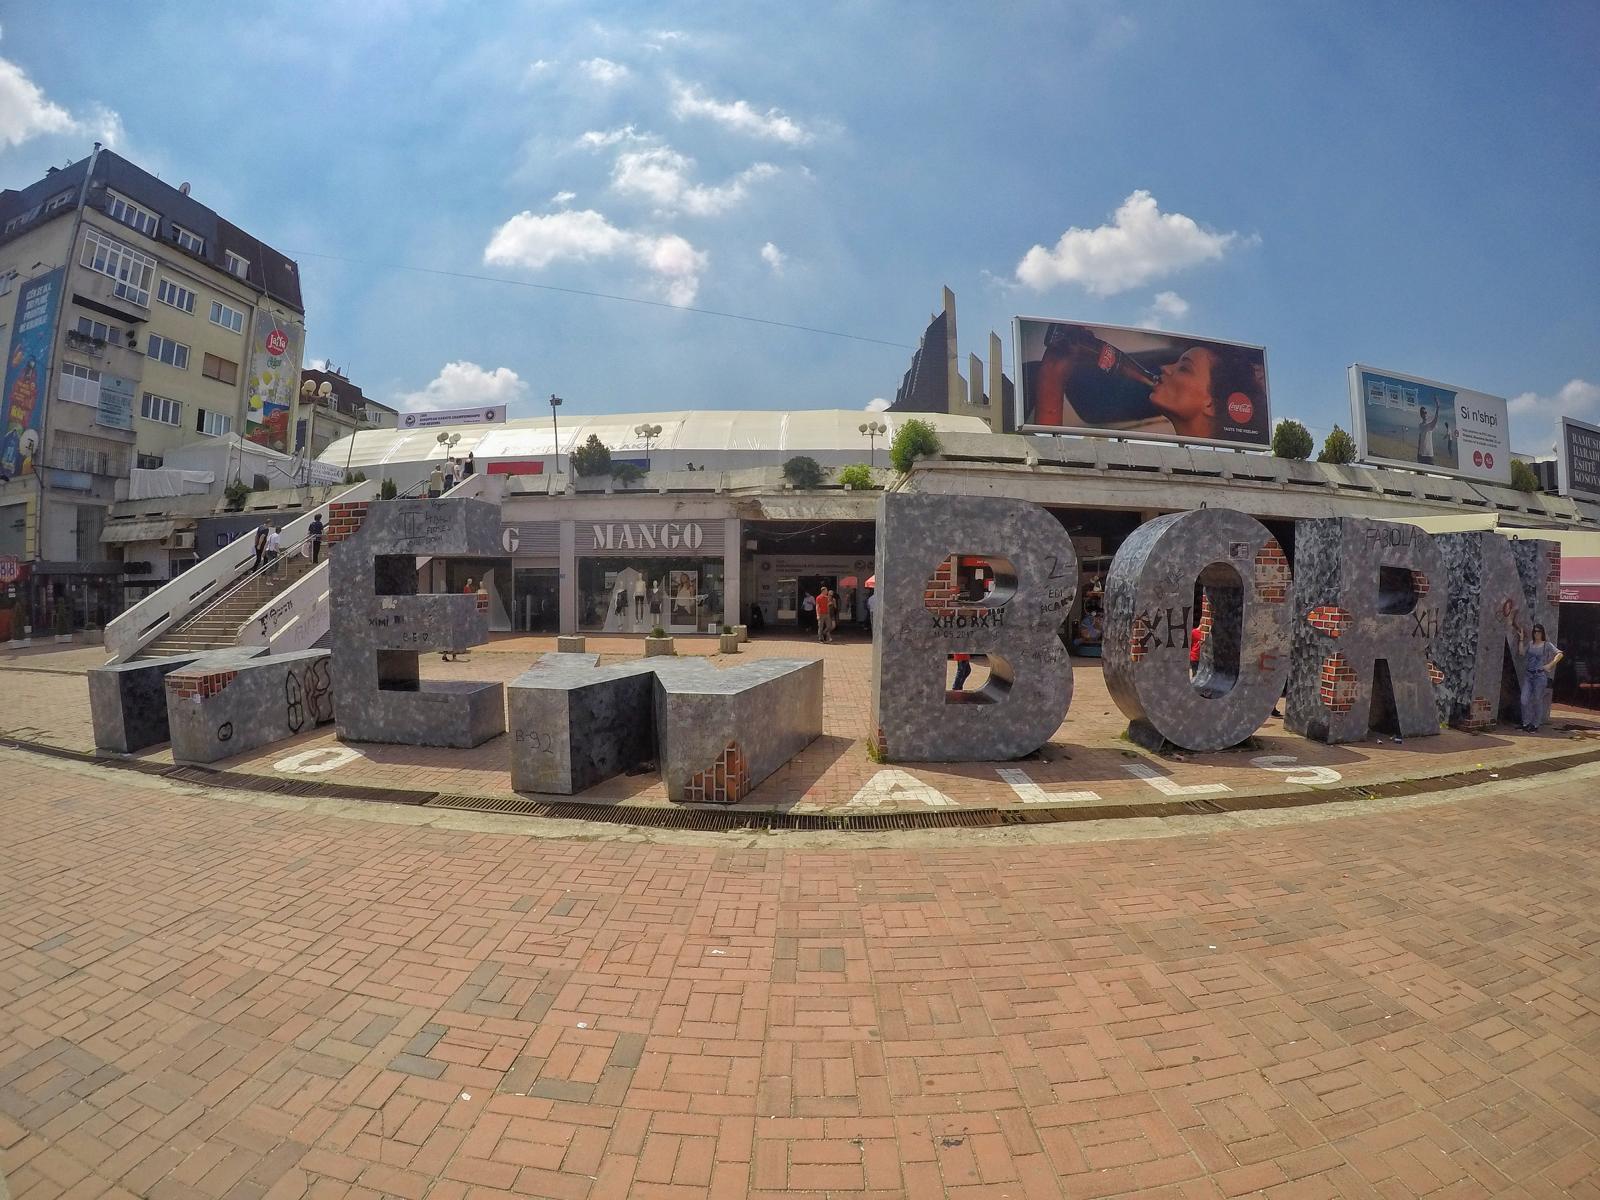 Tagesausflug nach Prishtina im Kosovo